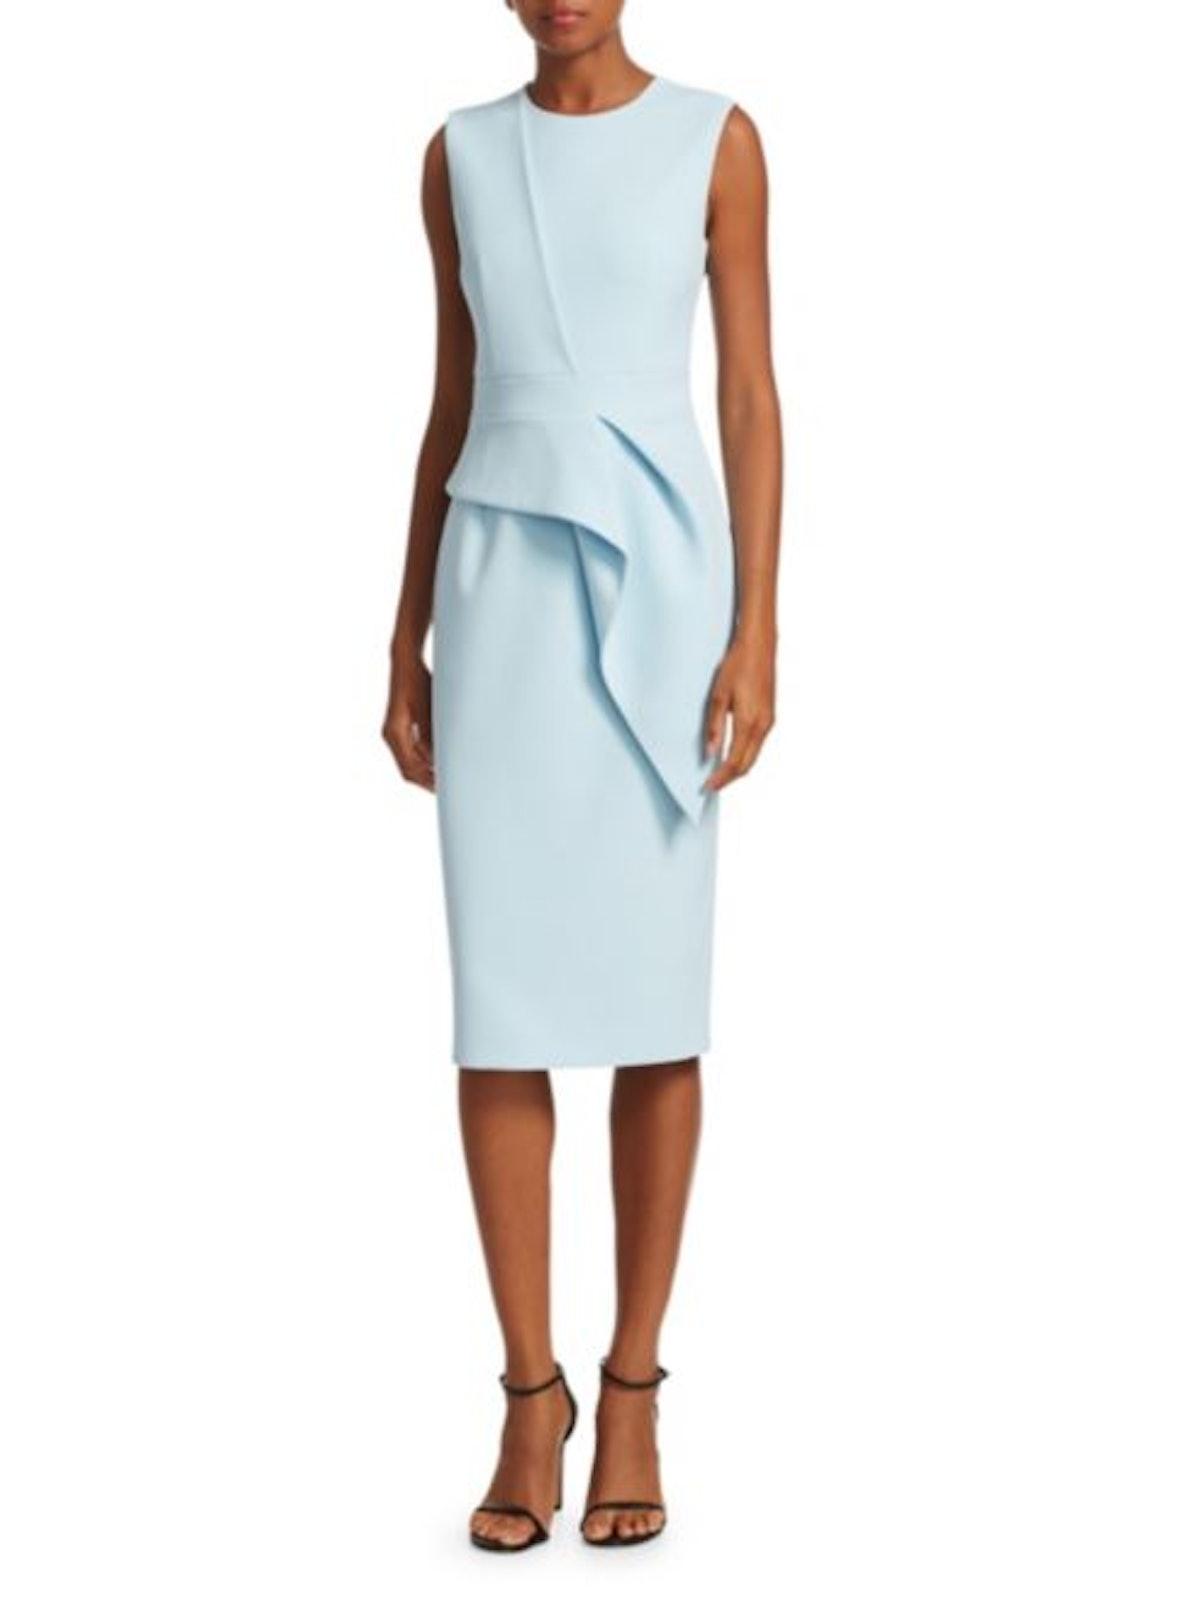 Peplum V-Neck Cocktail Sheath Dress